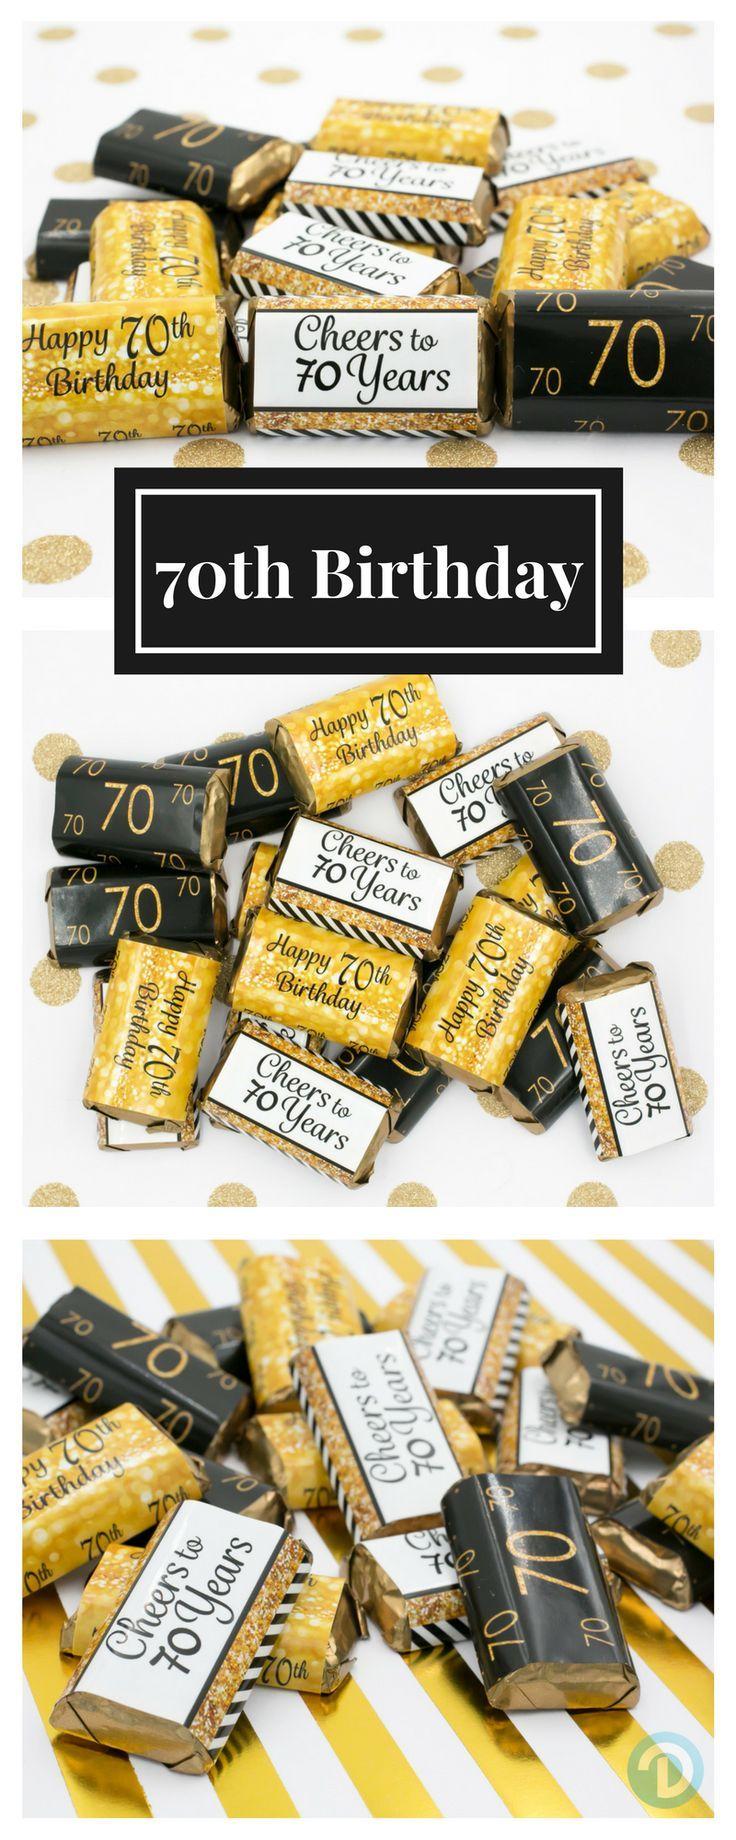 Fun Black Gold Themes Birthday Party Favor Idea 70thbirthday